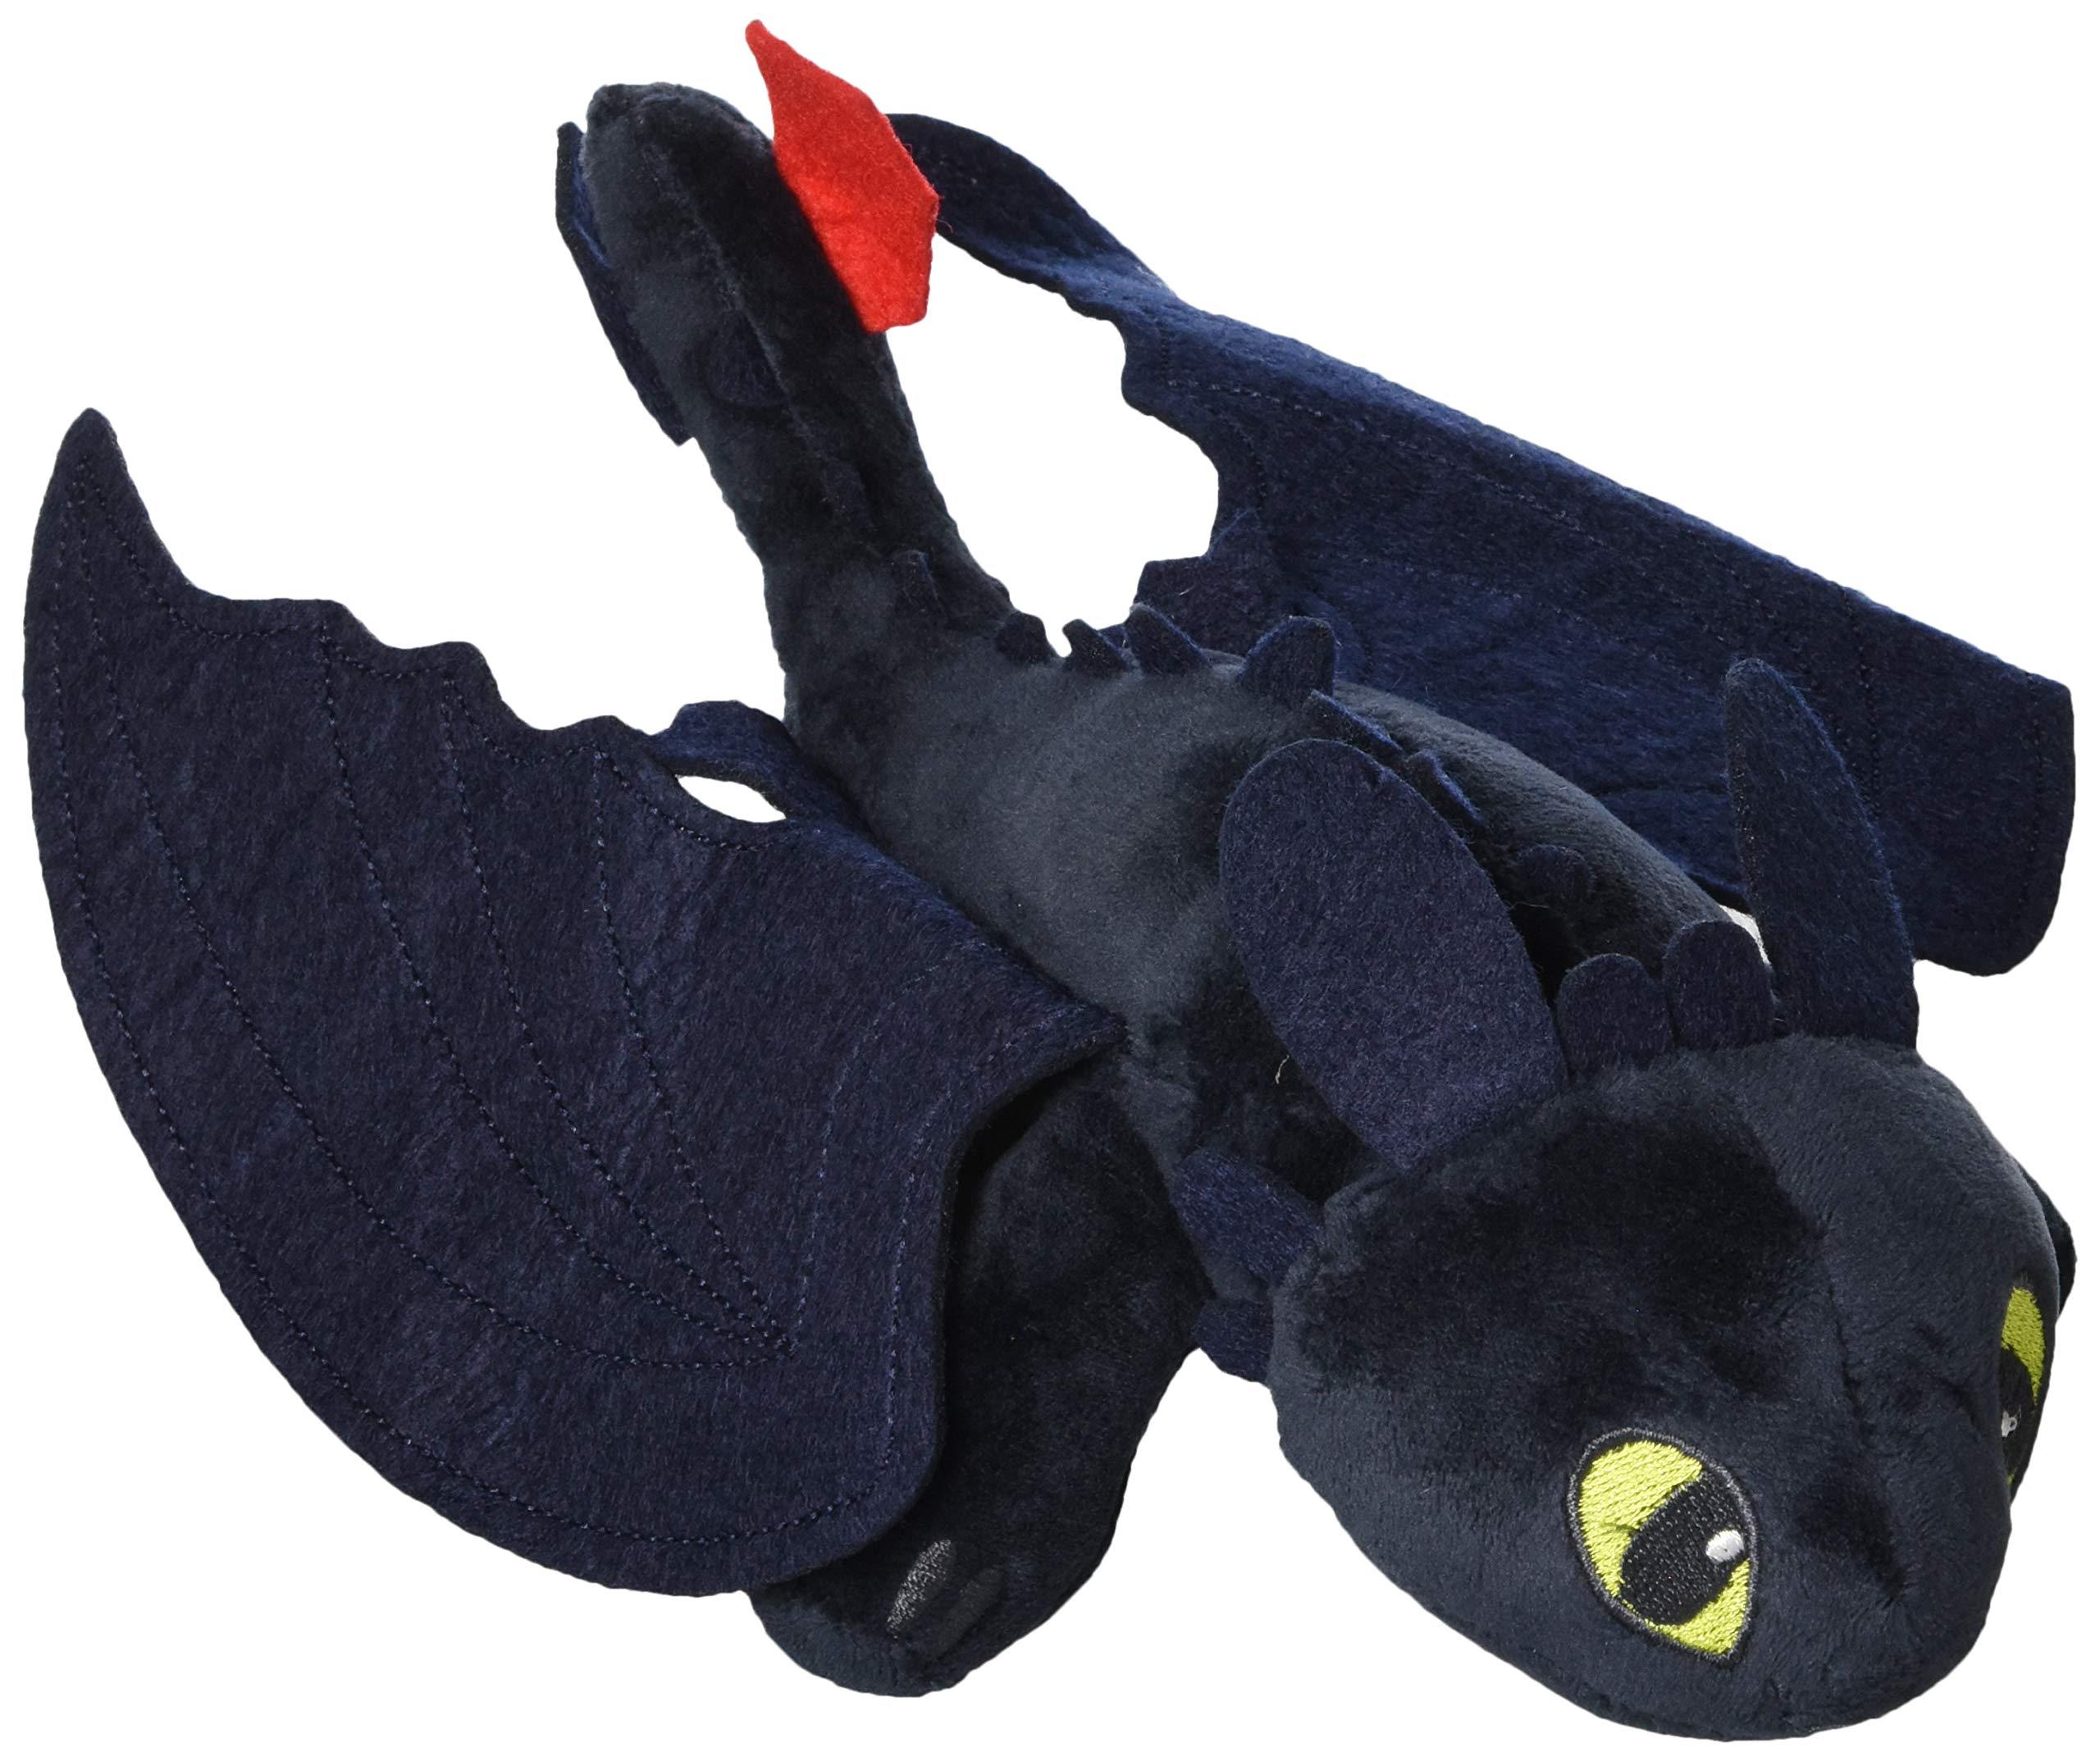 cddf181b7bd Amazon.com  Toothless Night Fury 1 Train 2 Stuffed Animal Plush Doll Toy  Dragons Defenders of Berk  Toys   Games